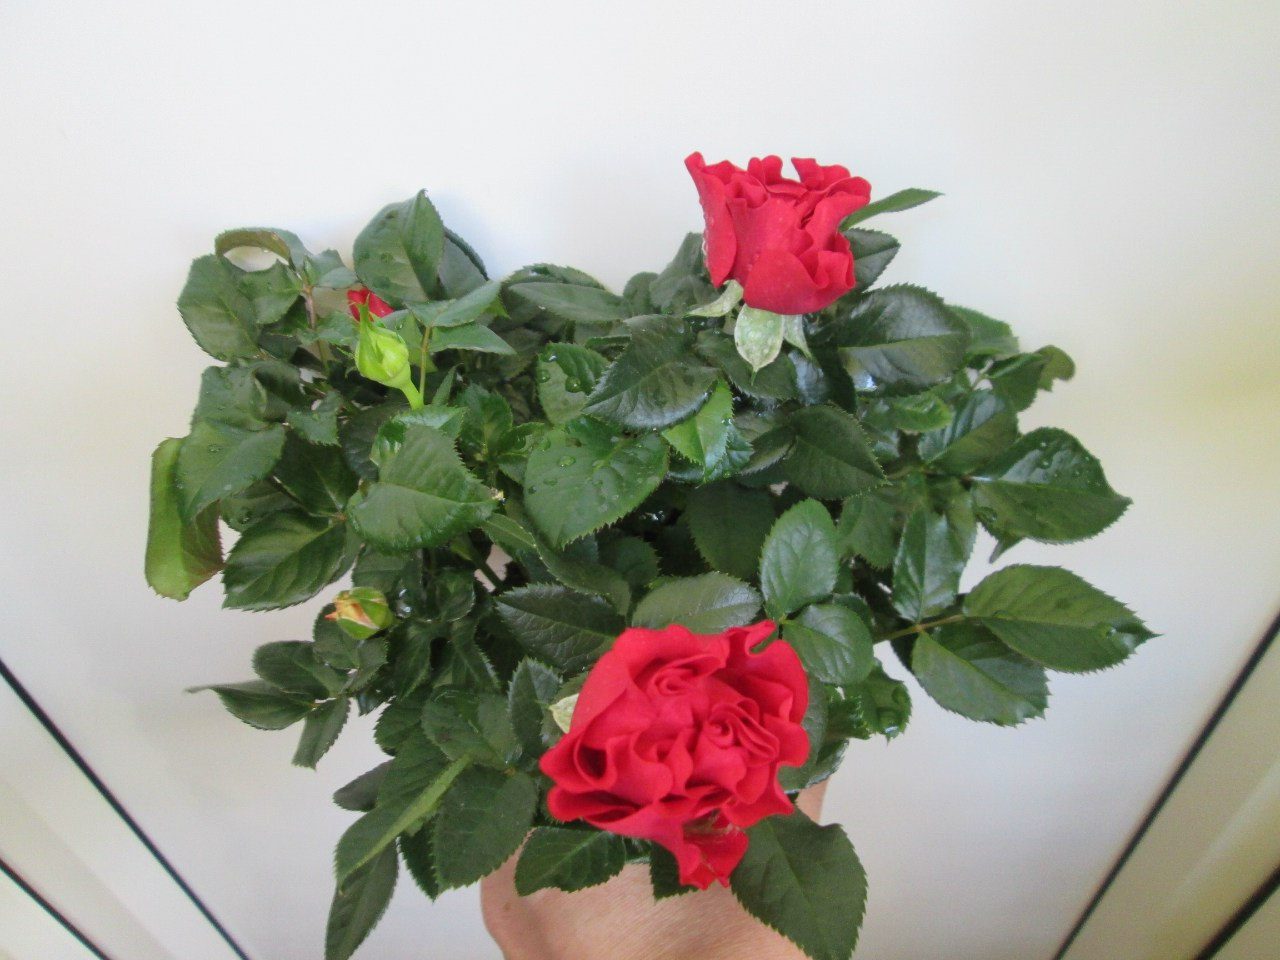 комнатная миниатюрная роза и уход за ней